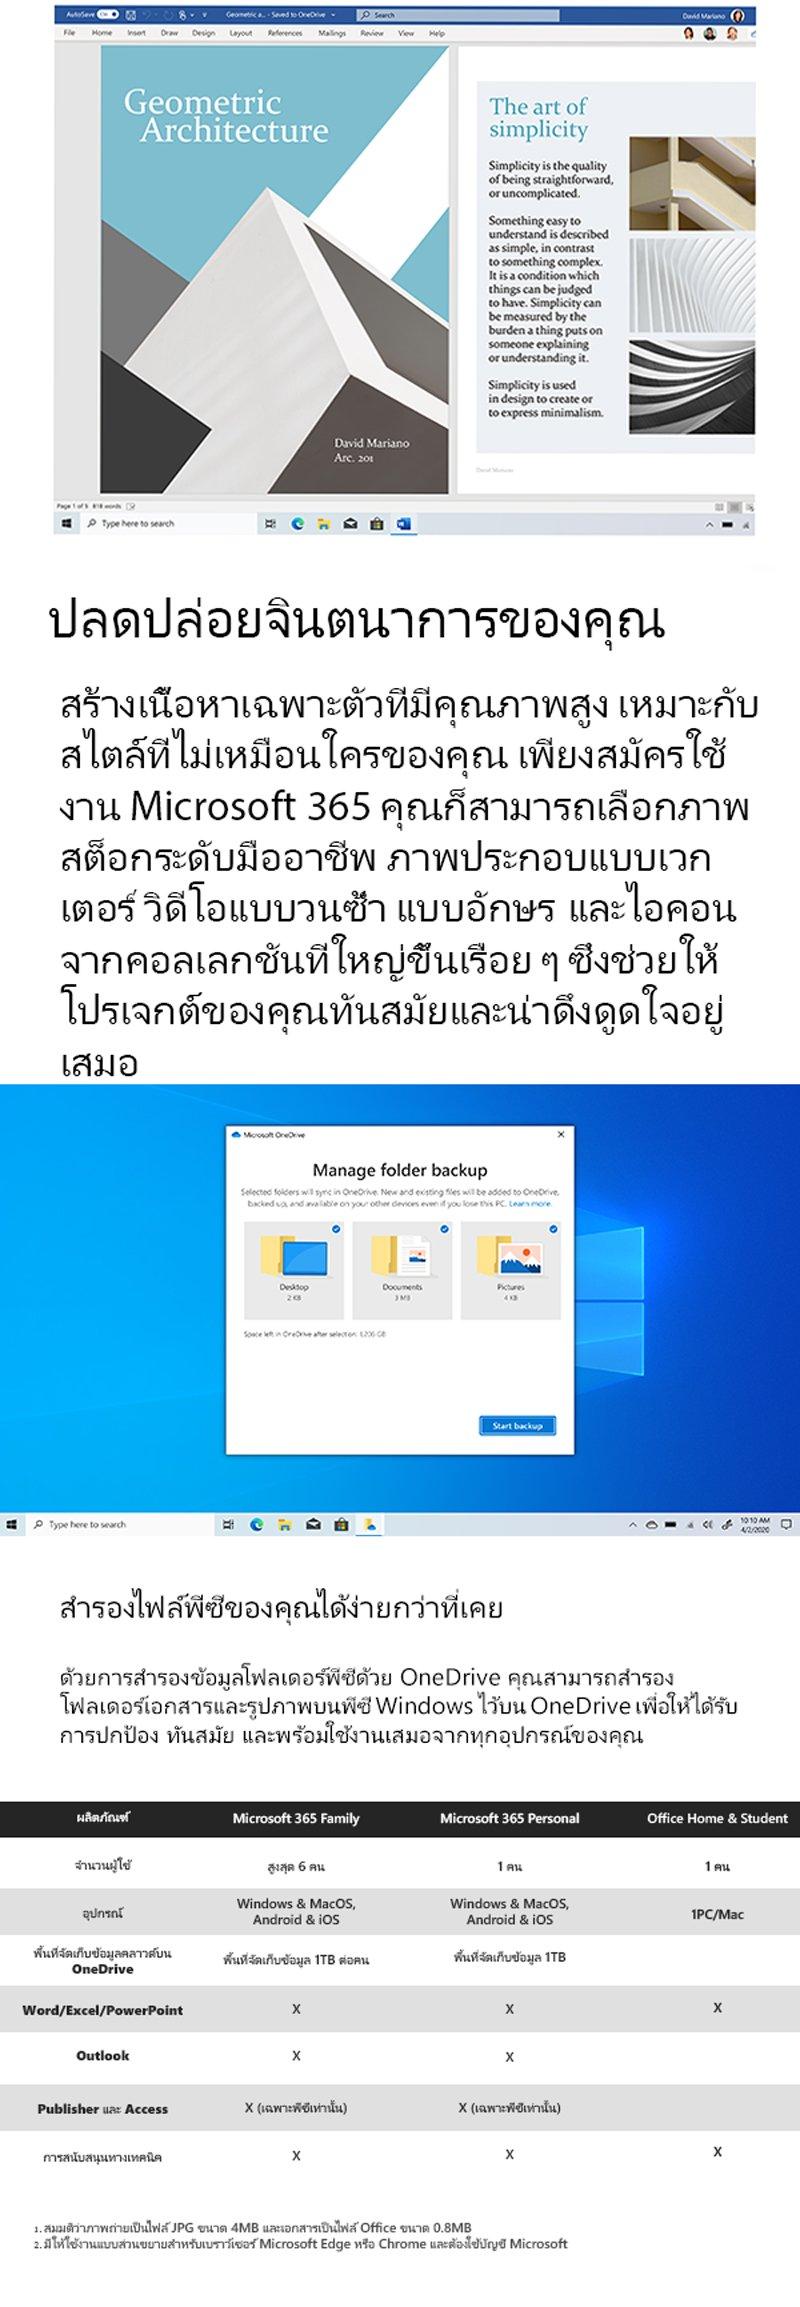 Microsoft Office 365 Home 1 year (O365H) 2019